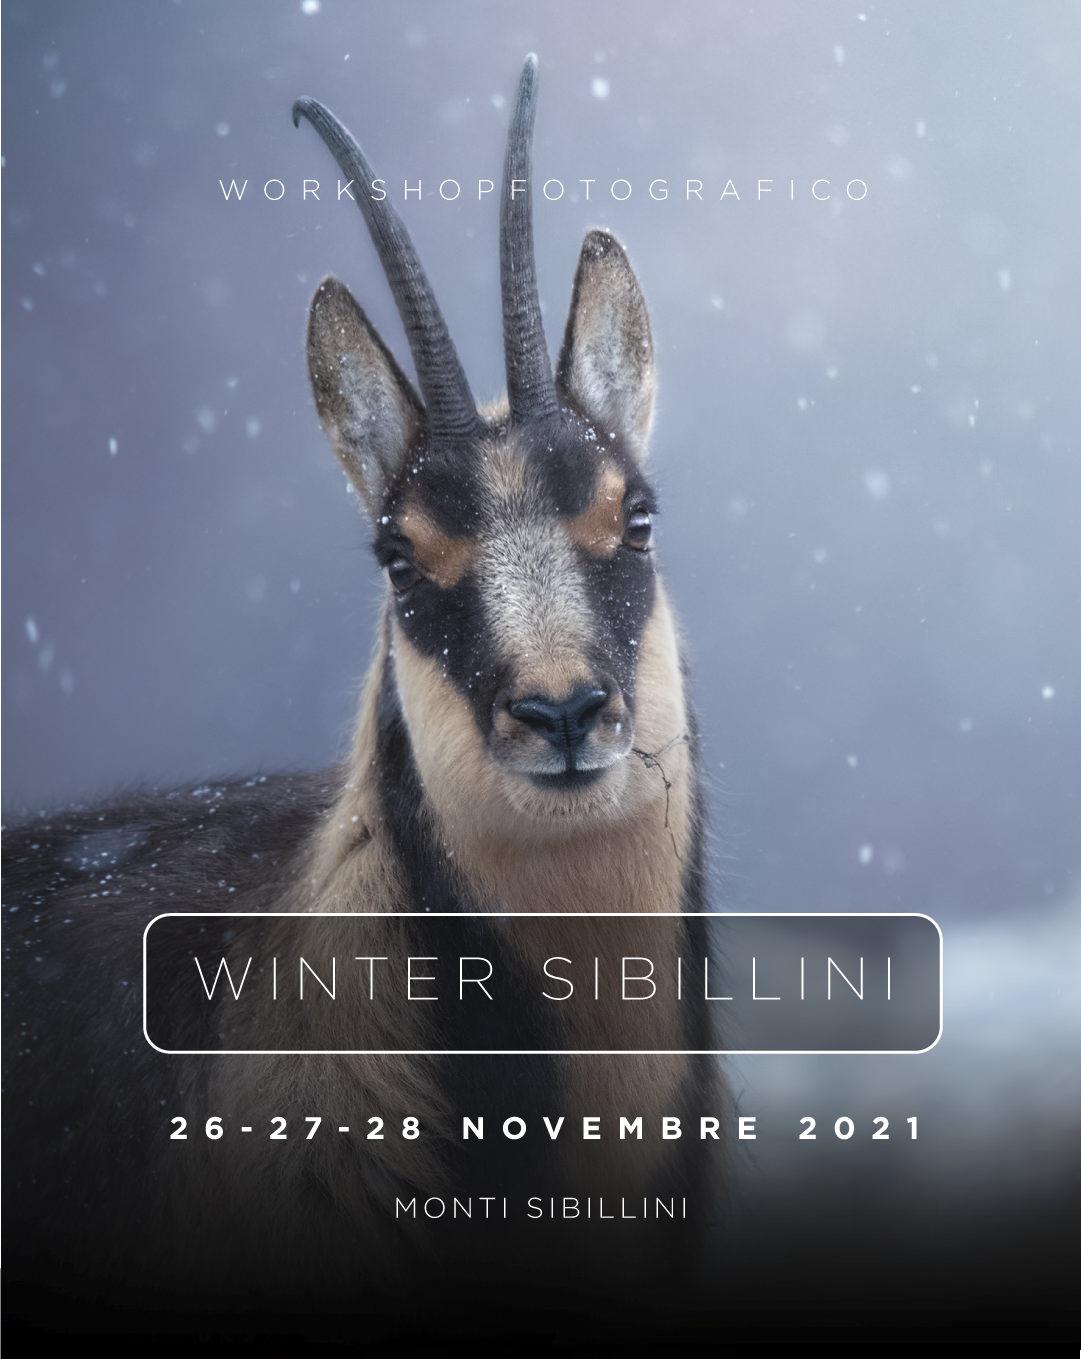 WinterSibillini workshop di fotografia naturalistica